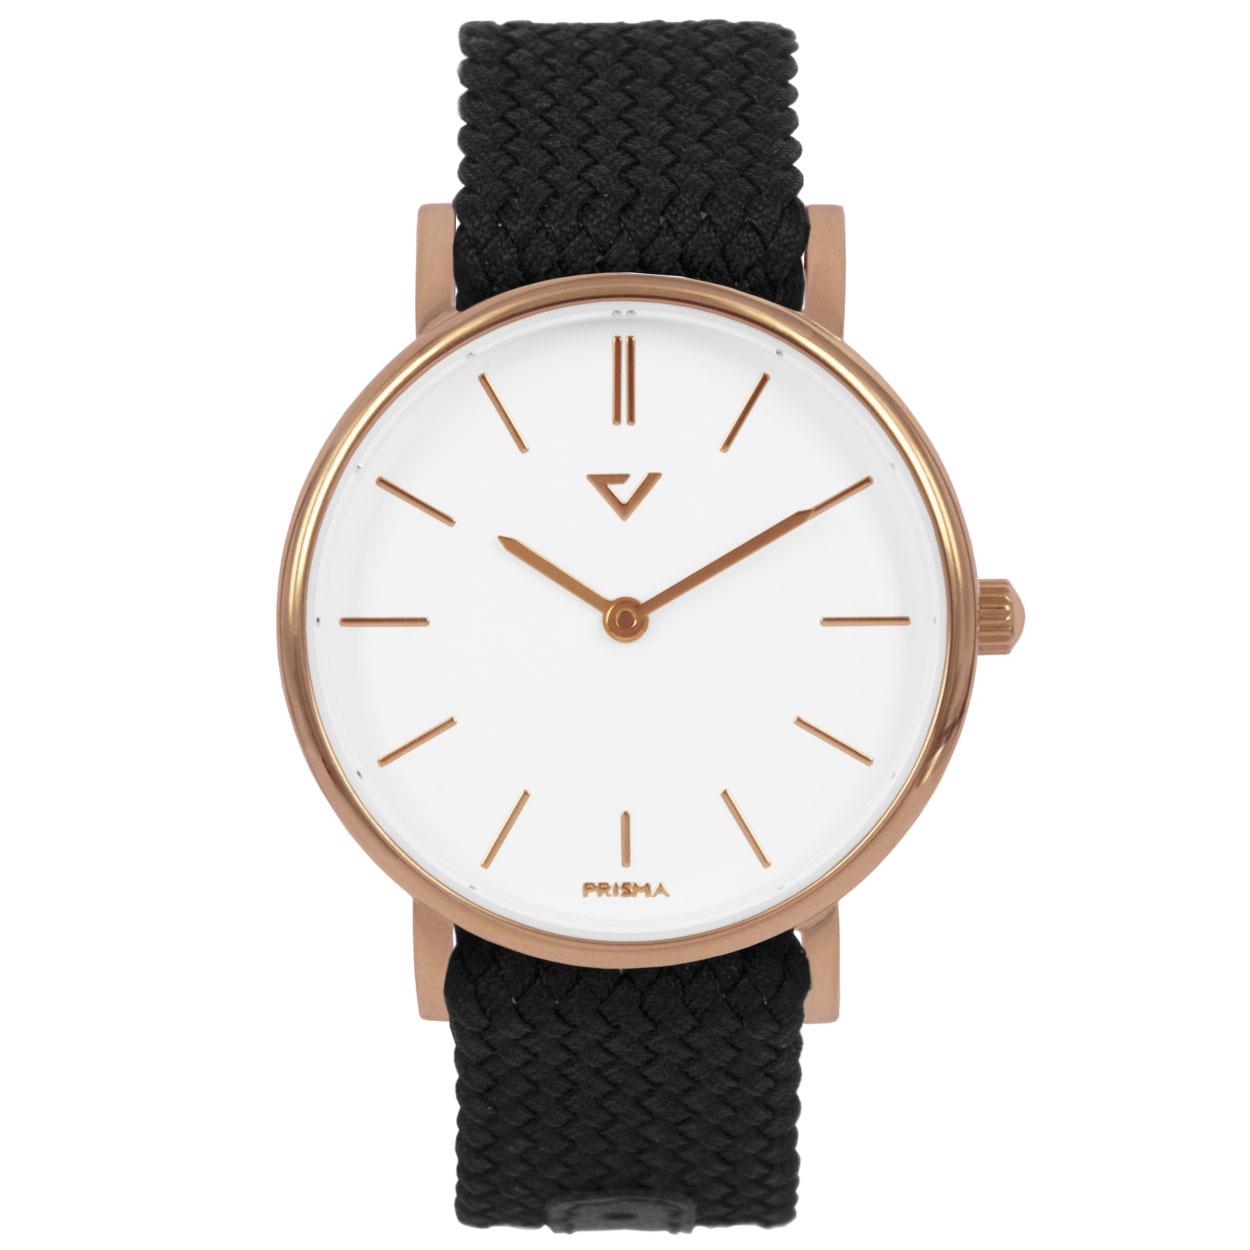 Prisma horloge P.1629.WG26 Lederen band Rose goud